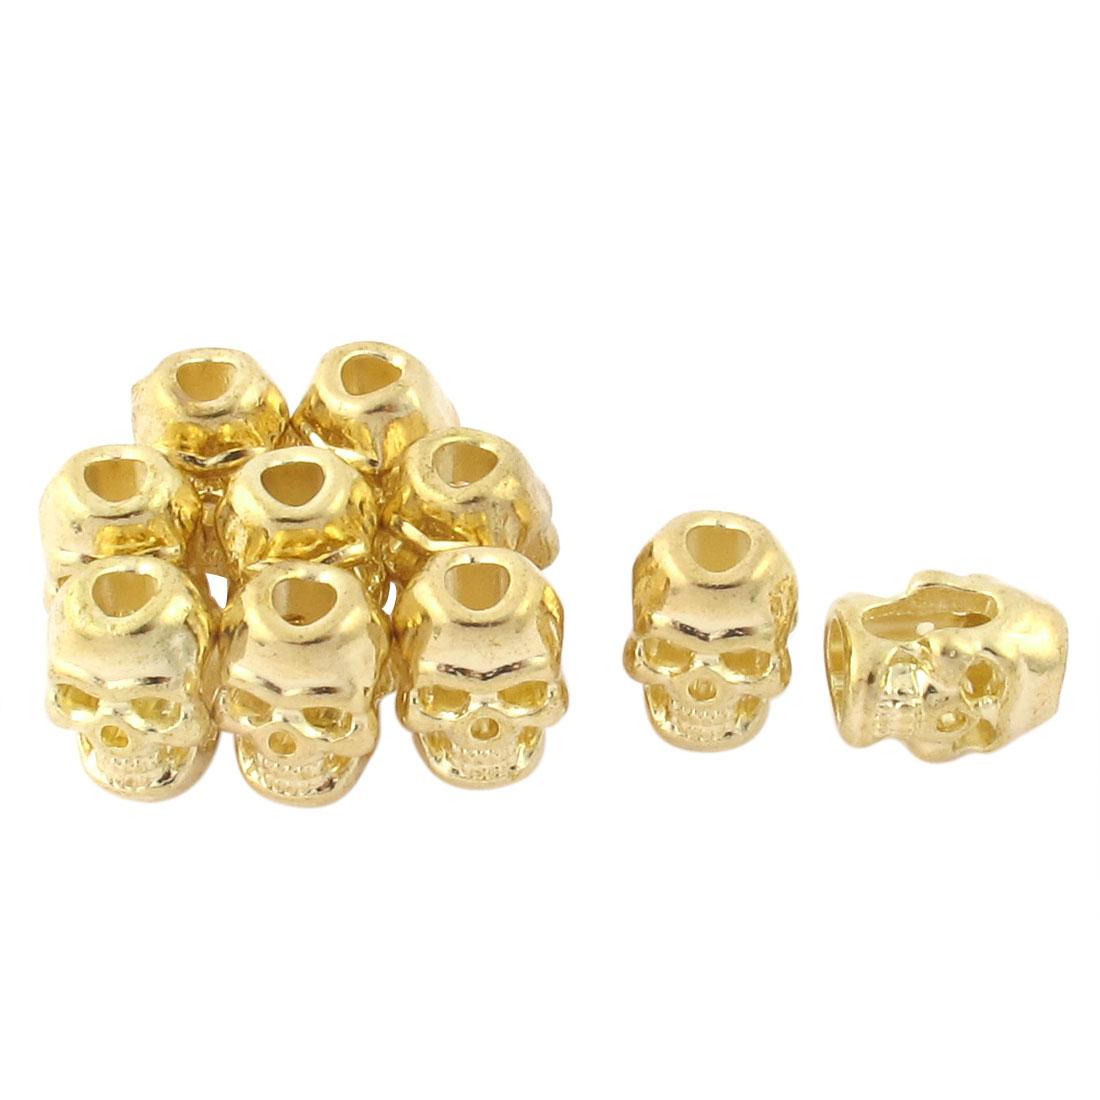 10 Pcs Gold Tone Skull Head Style Necklace Pendant Charm Bead DIY Bracelet